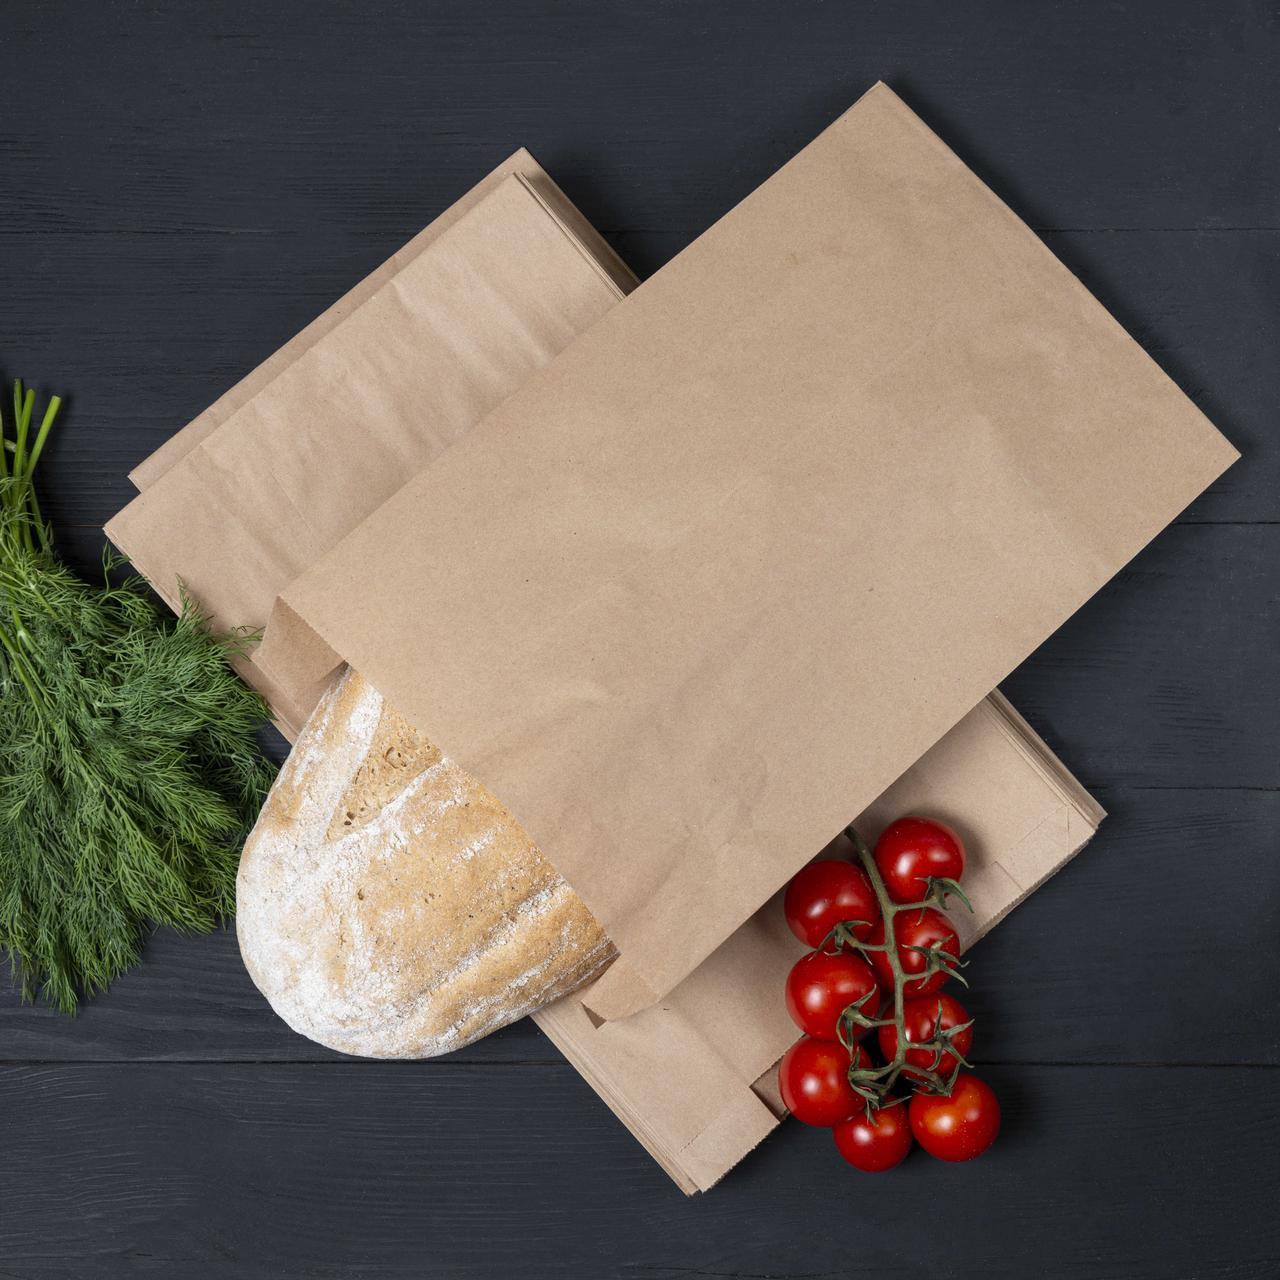 Бумажный крафт пакет саше 220*60*340 мм Пакеты бумажные для фасовки